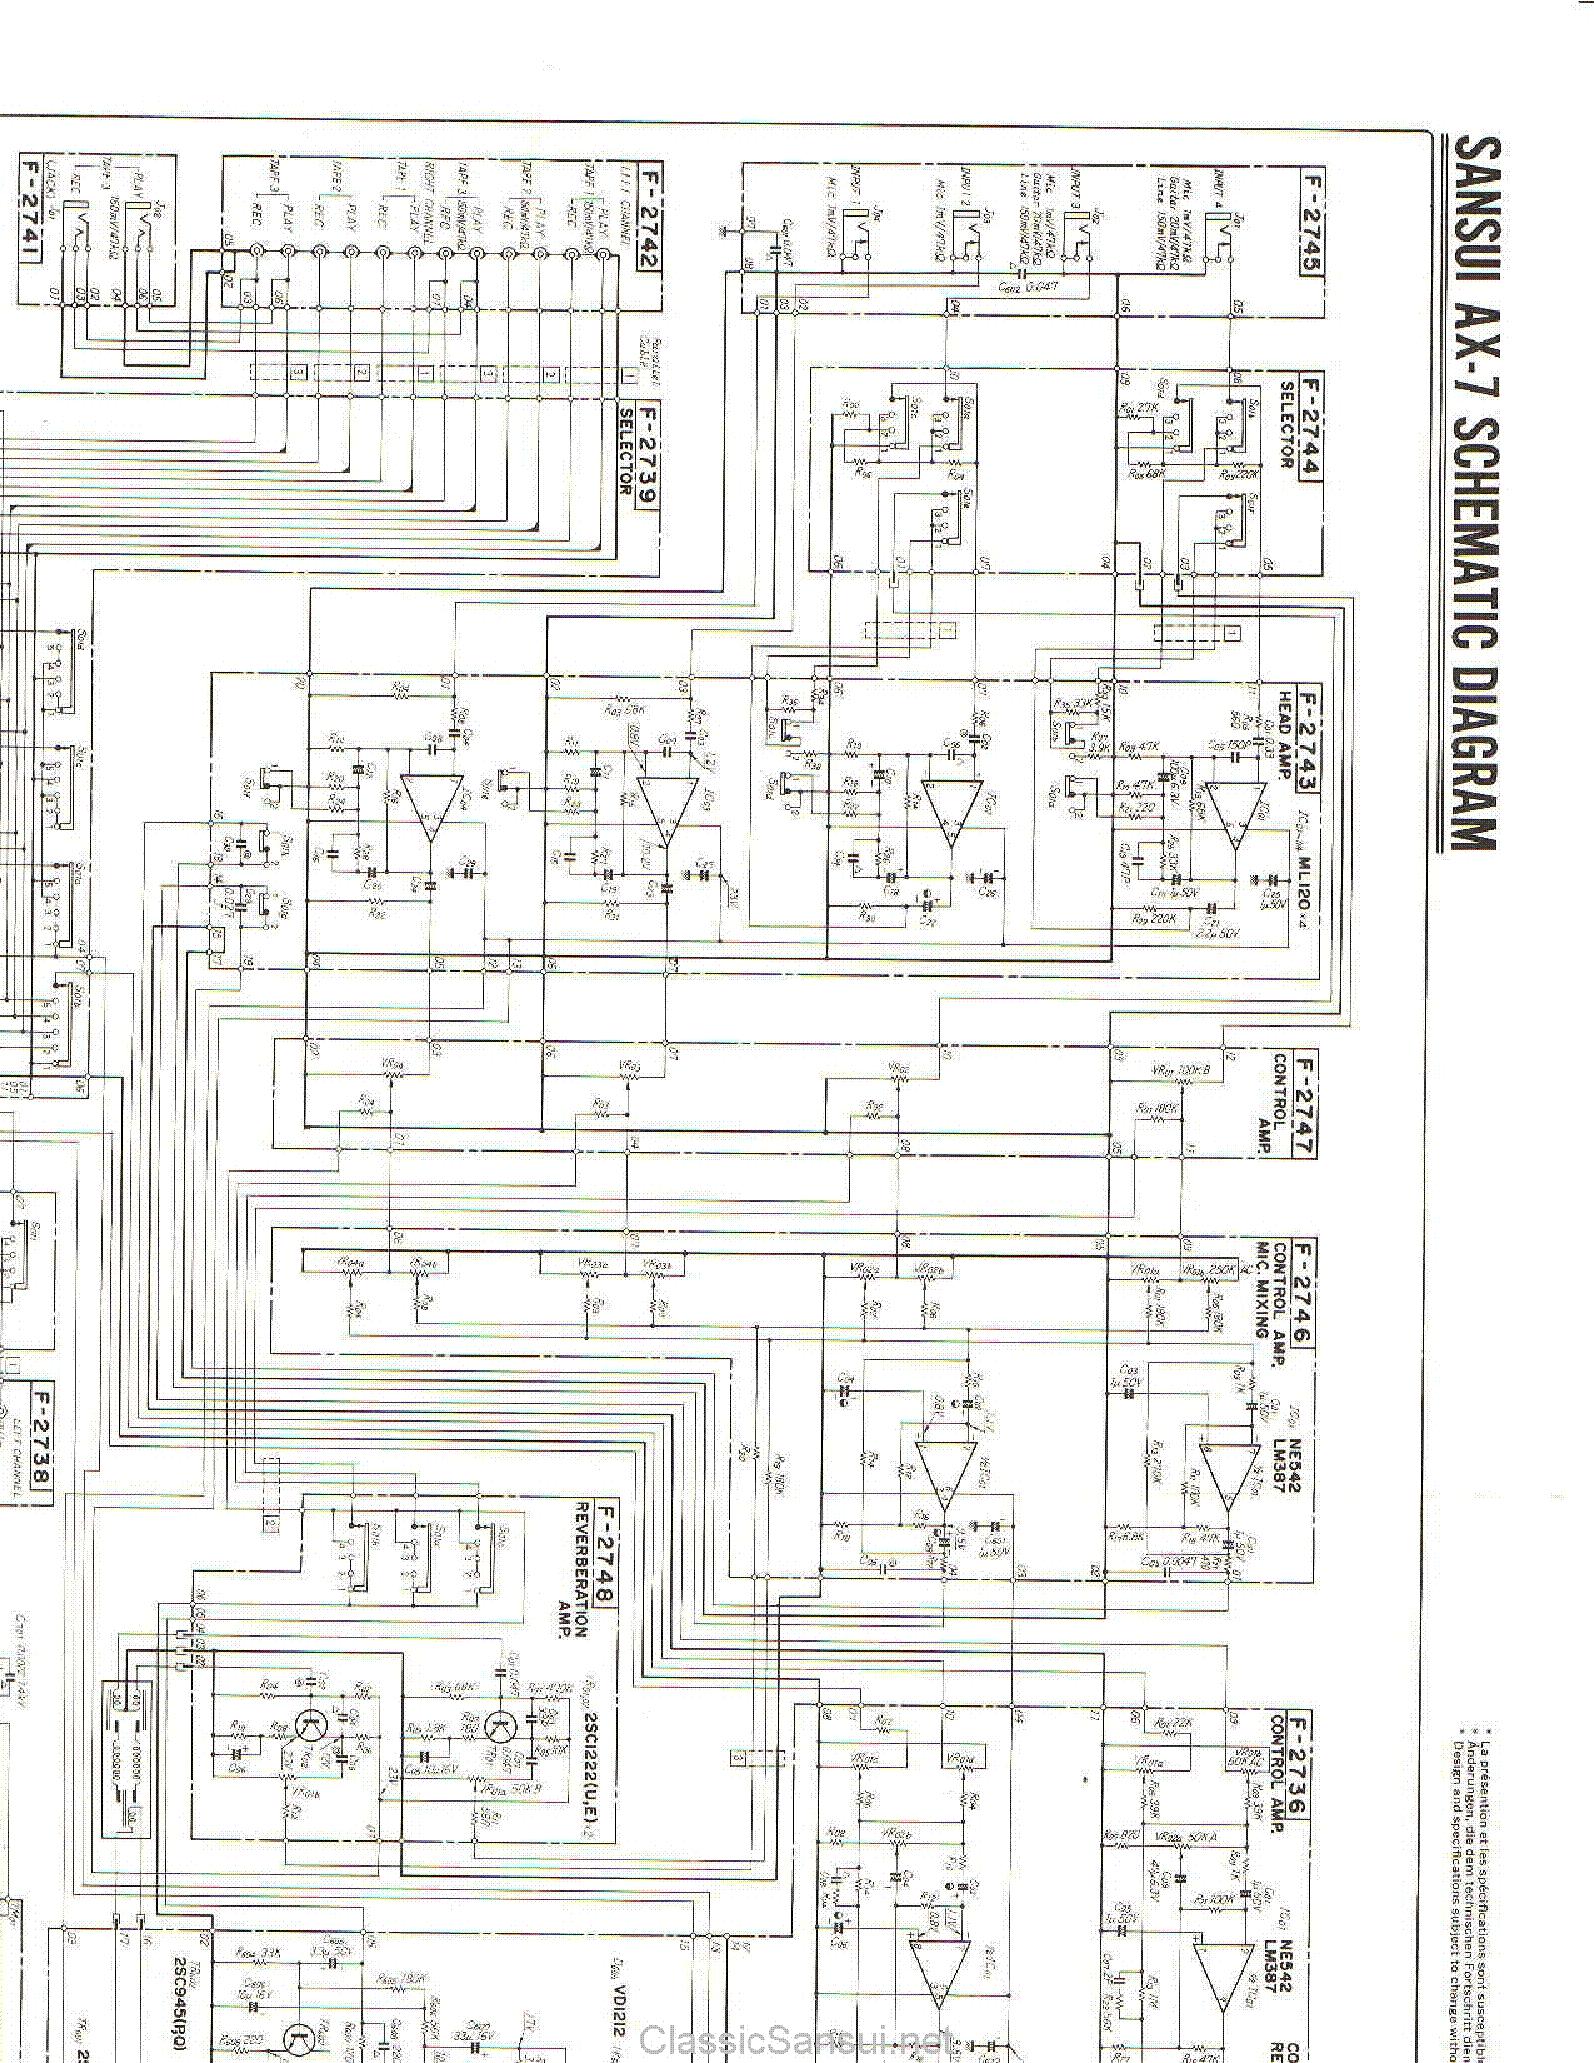 sansui fr d4 sm service manual download schematics eeprom repair rh elektrotanya com Avenged Sevenfold Tattoos Synyster Gates